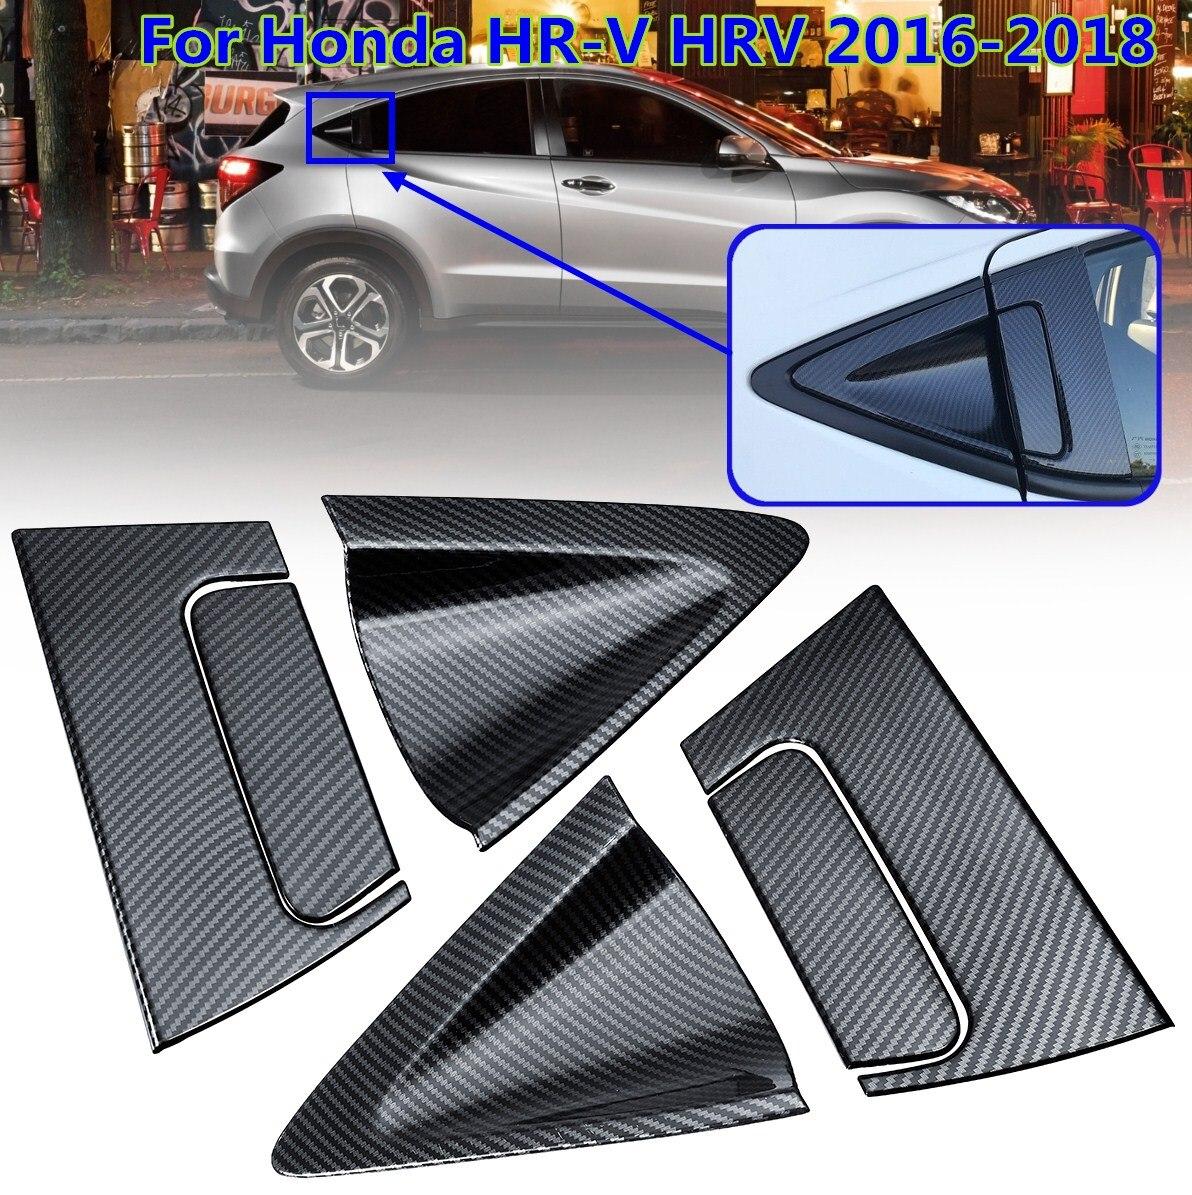 For Honda For HR-V HRV 2016-2018 Car Accessories 6pcs ABS Chrome/Carbon Fiber Side Rear Door Handle Cover Bowl Cover Insert Trim